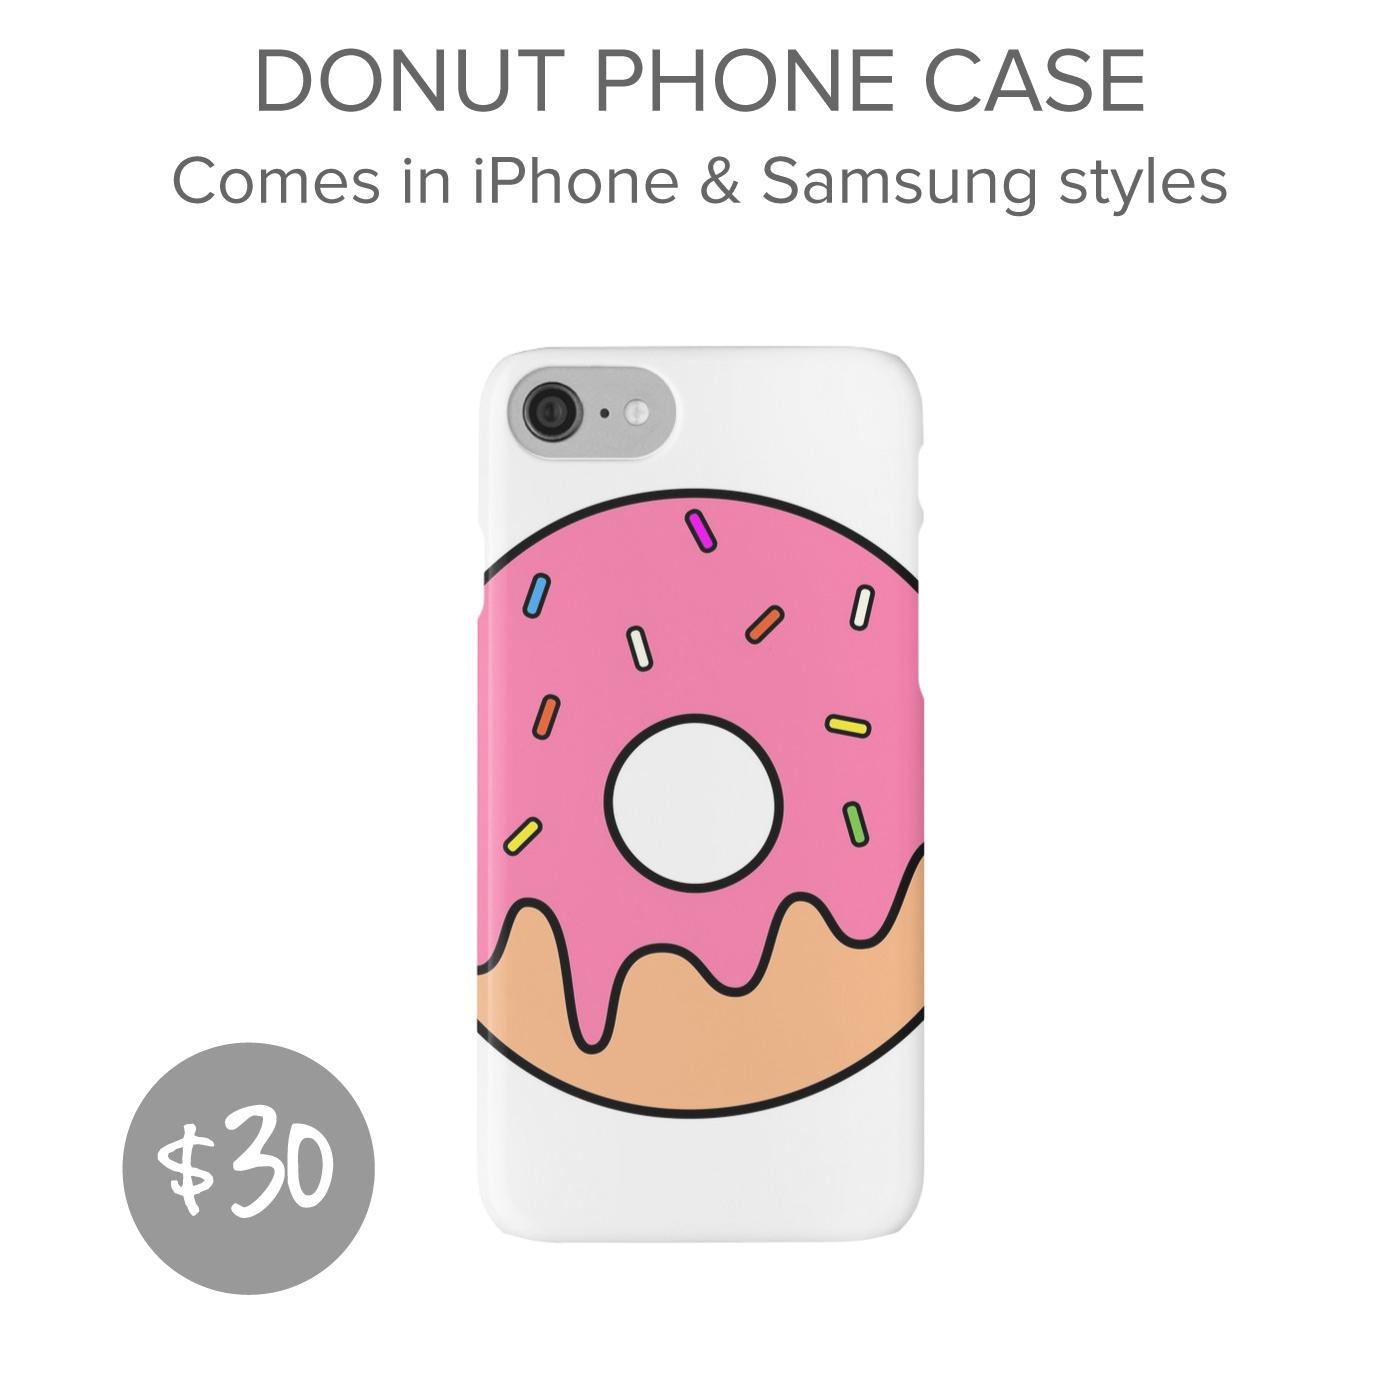 DONUT-PHONE-CASE.jpg